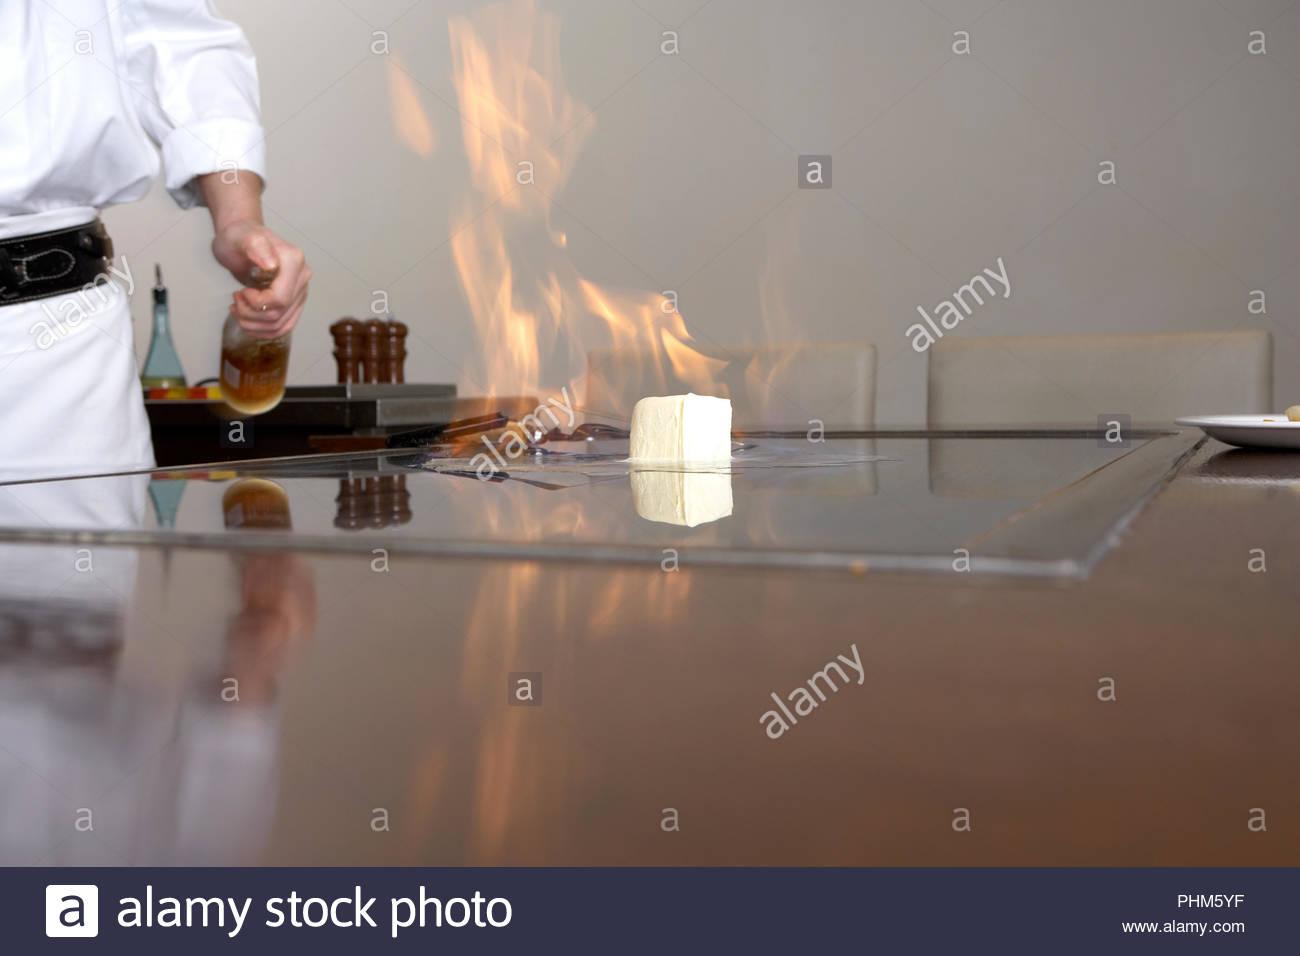 Chef flambeing cheese - Stock Image